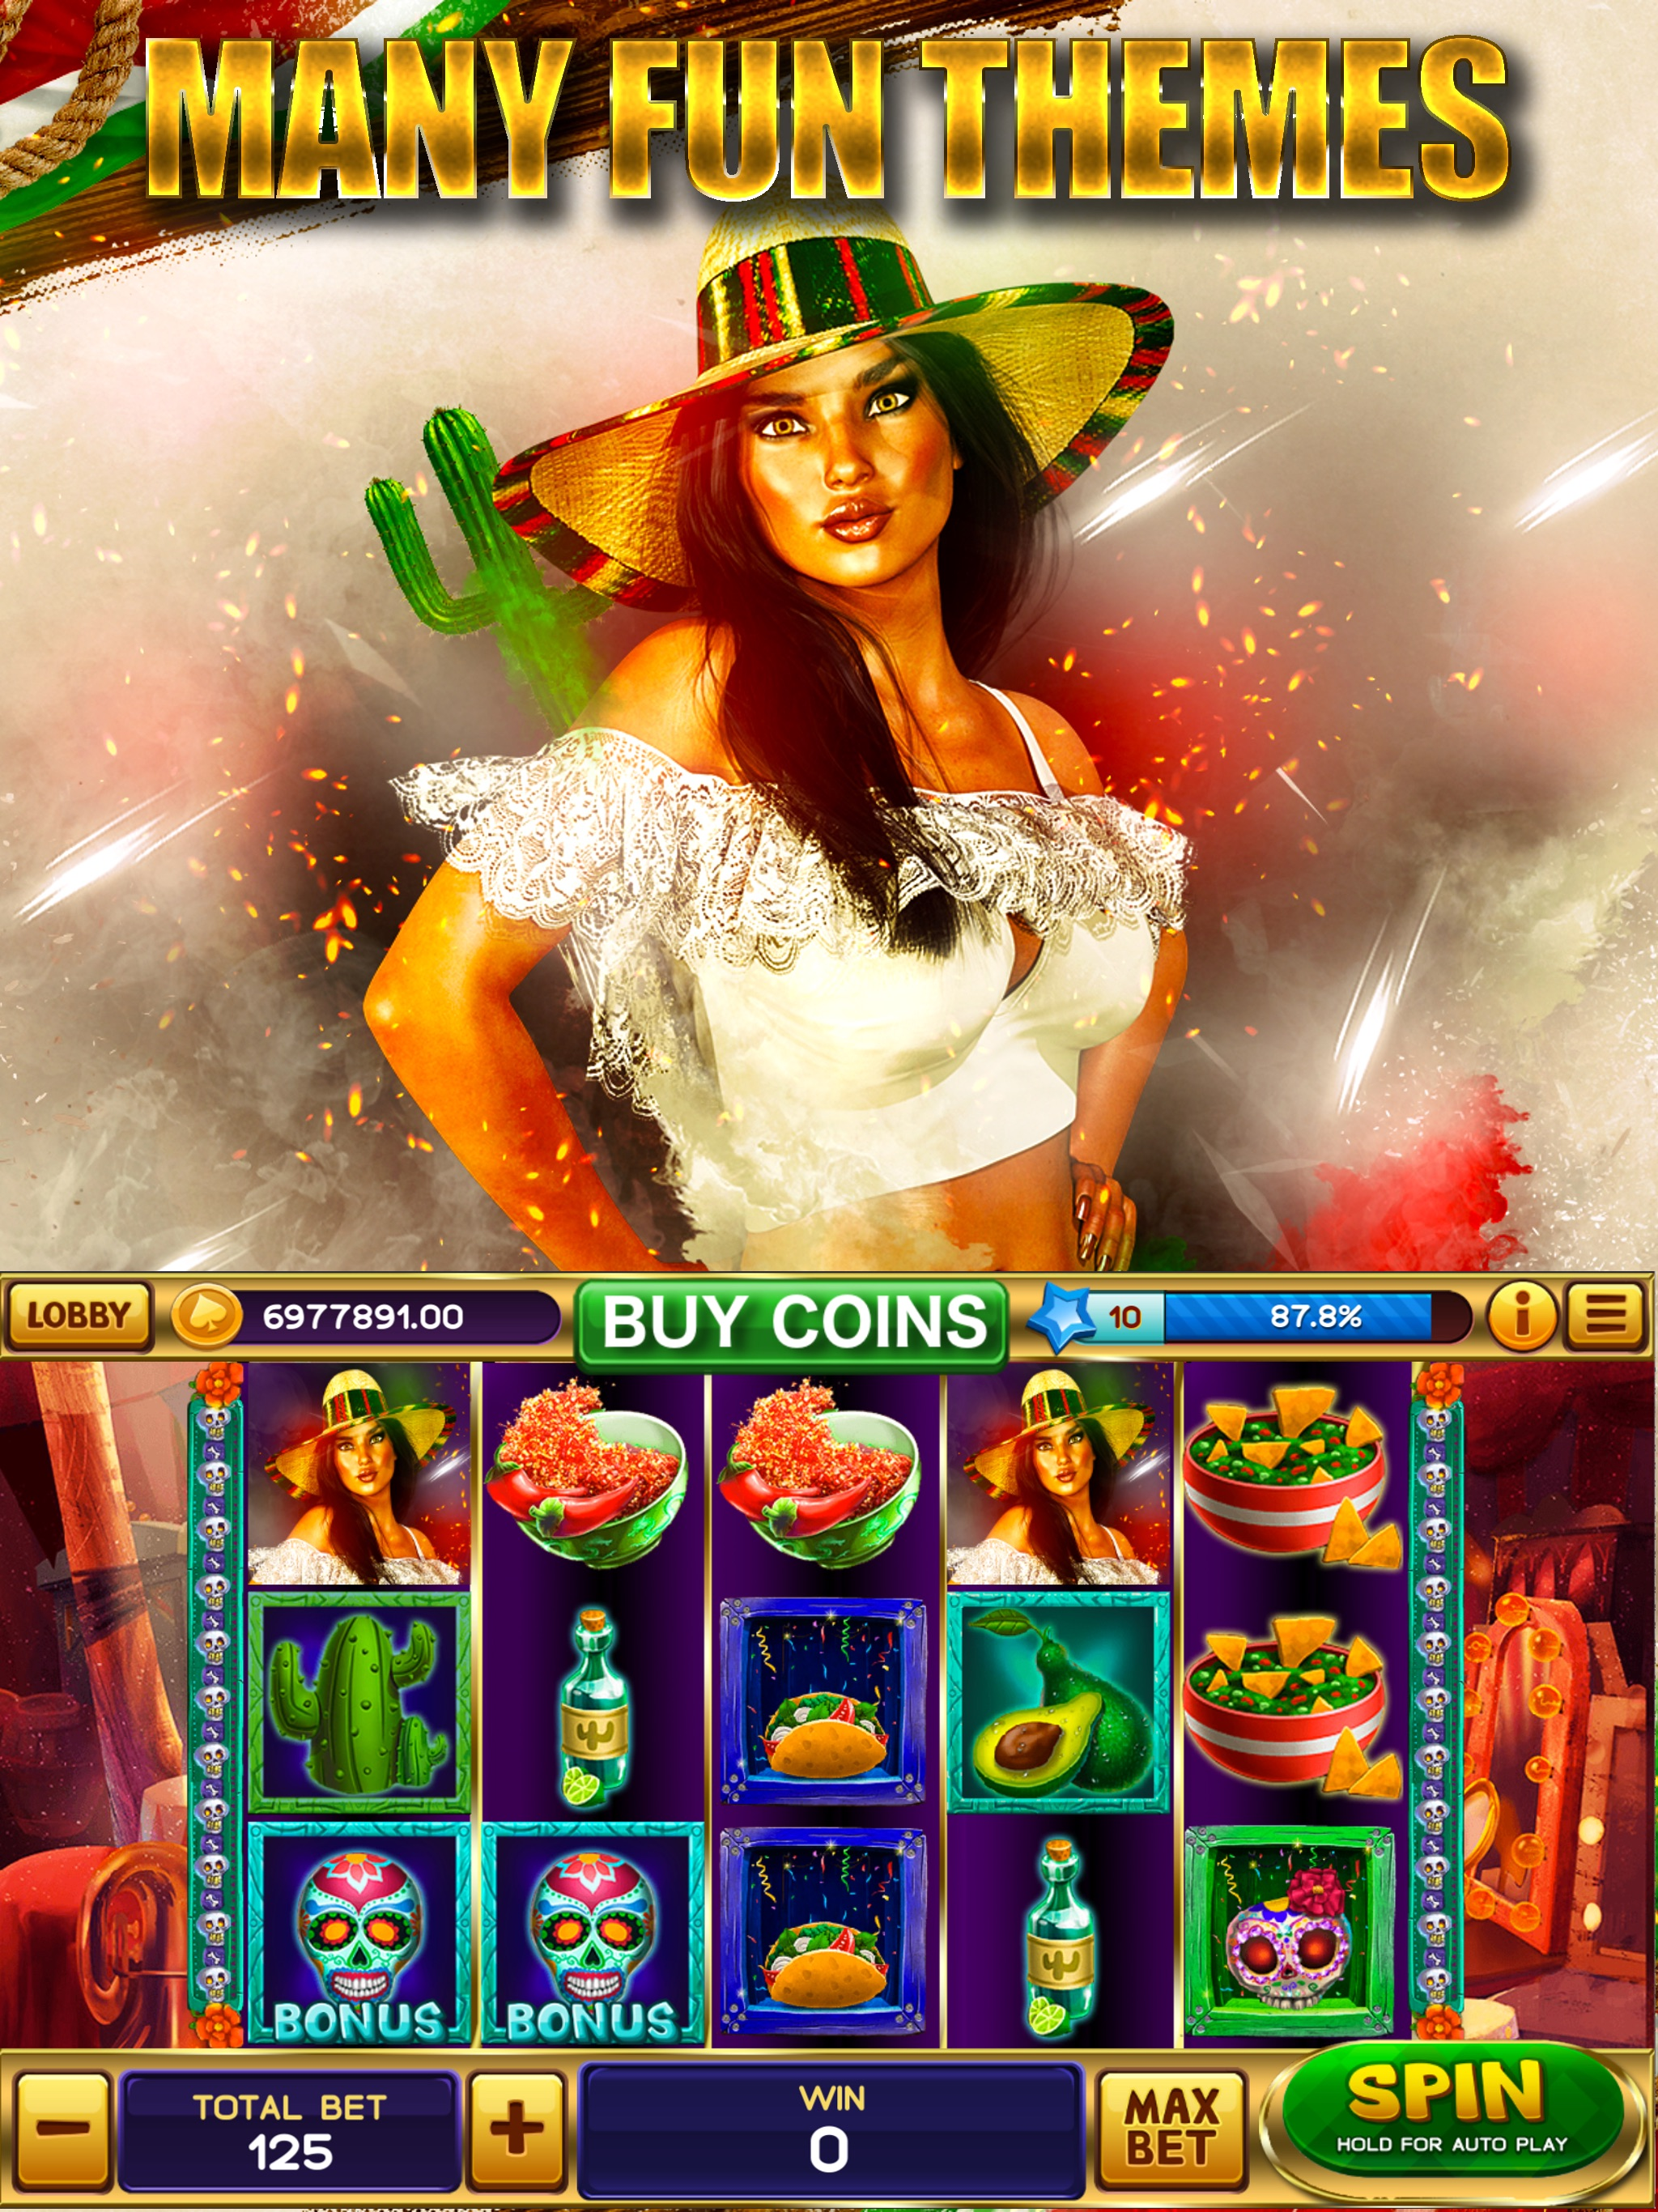 Poker coin